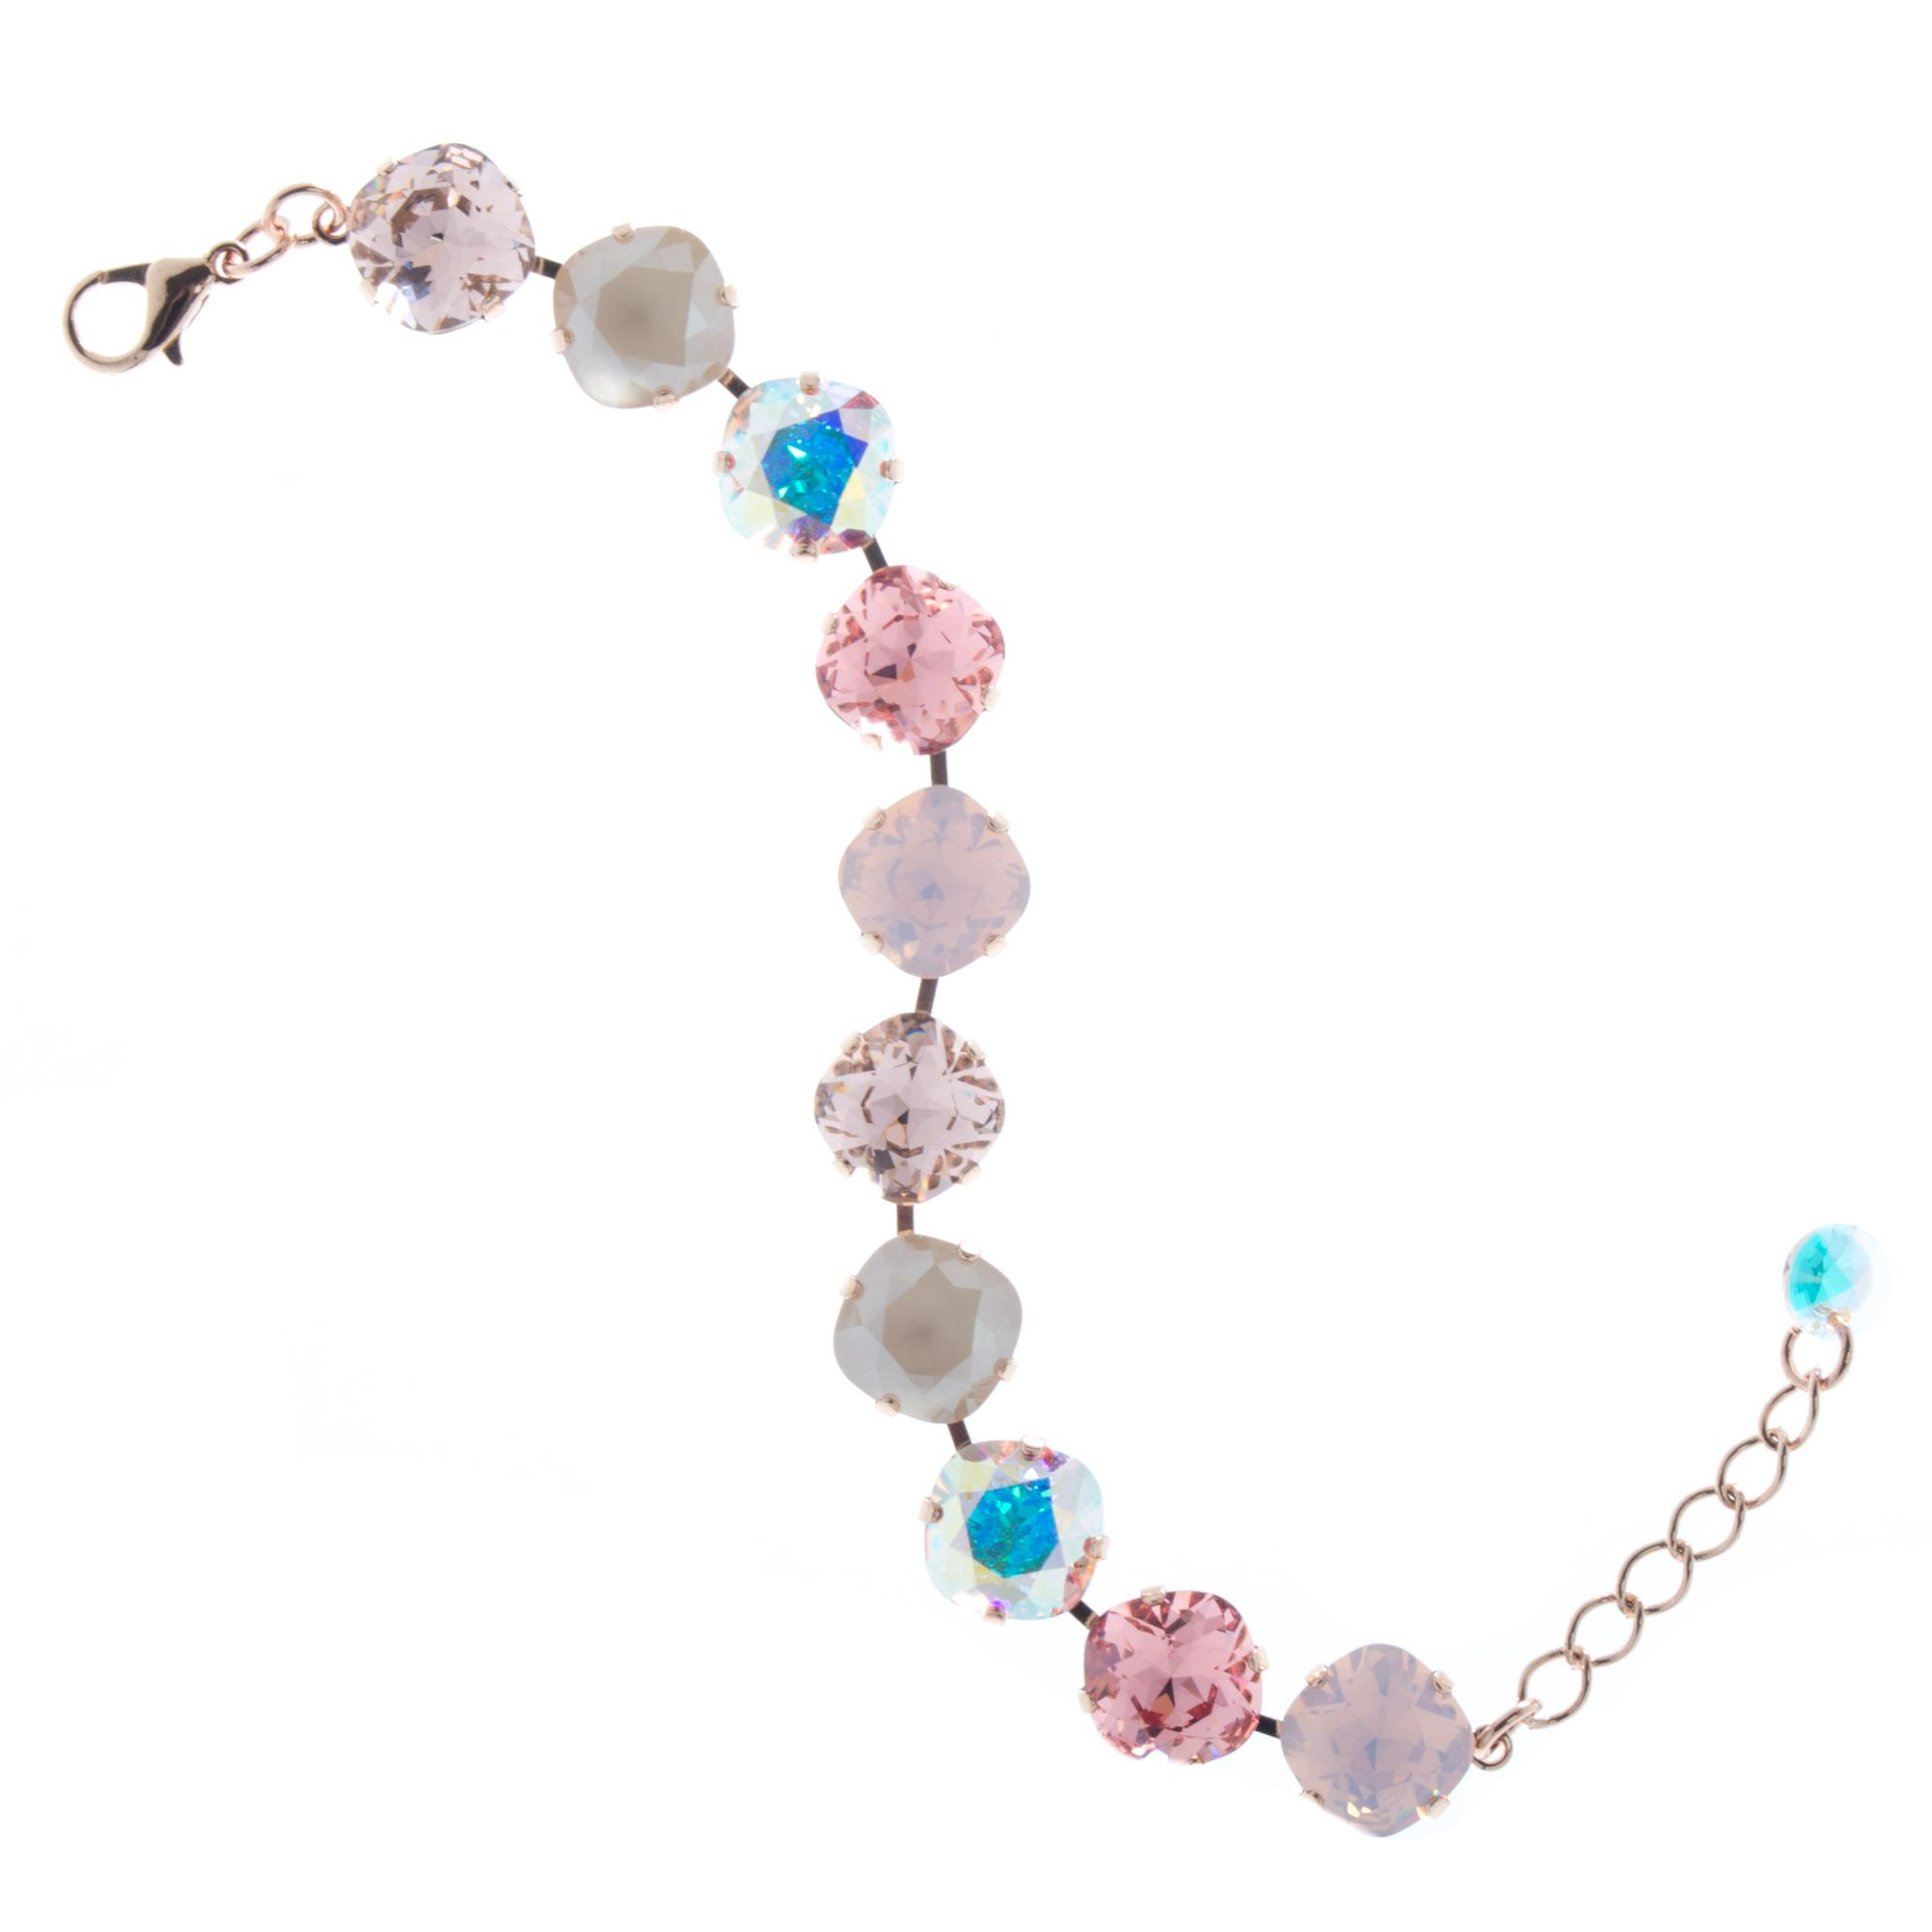 2fb02b54867893 Lisa Marie Jewelry 12mm Square Swarovski Crystal Bracelet - Rose Combo